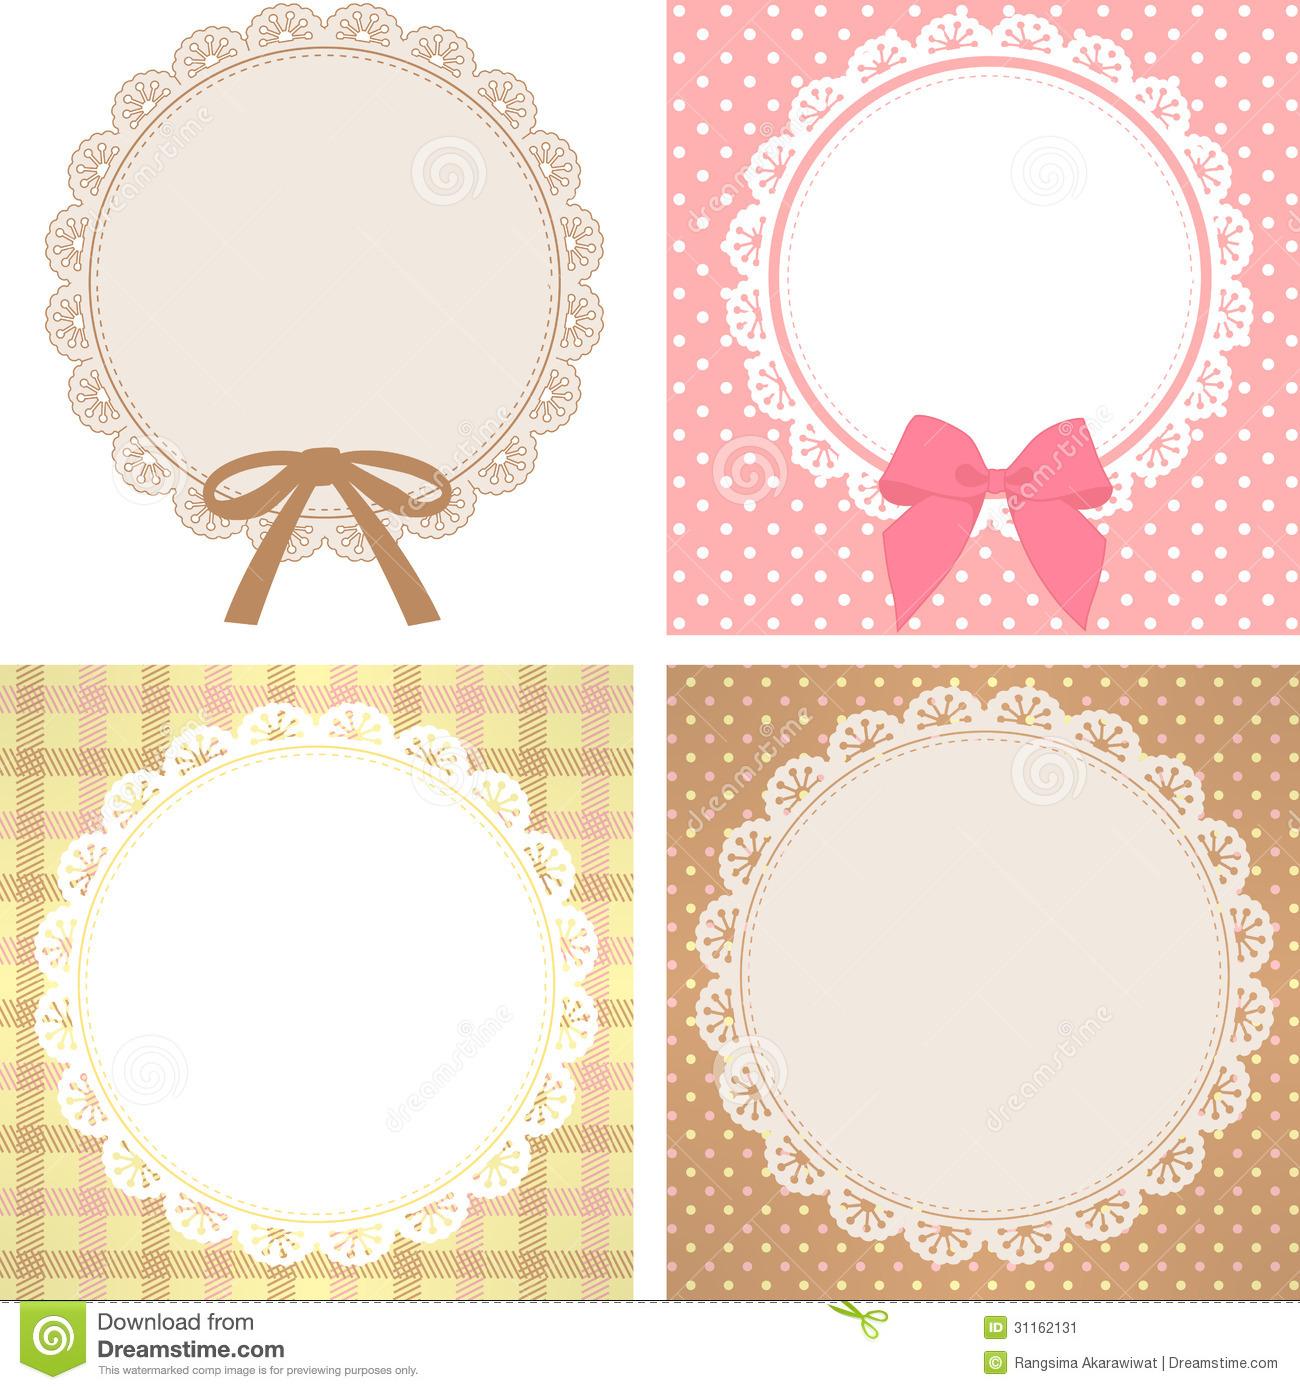 Free clip art images. Lace clipart cute